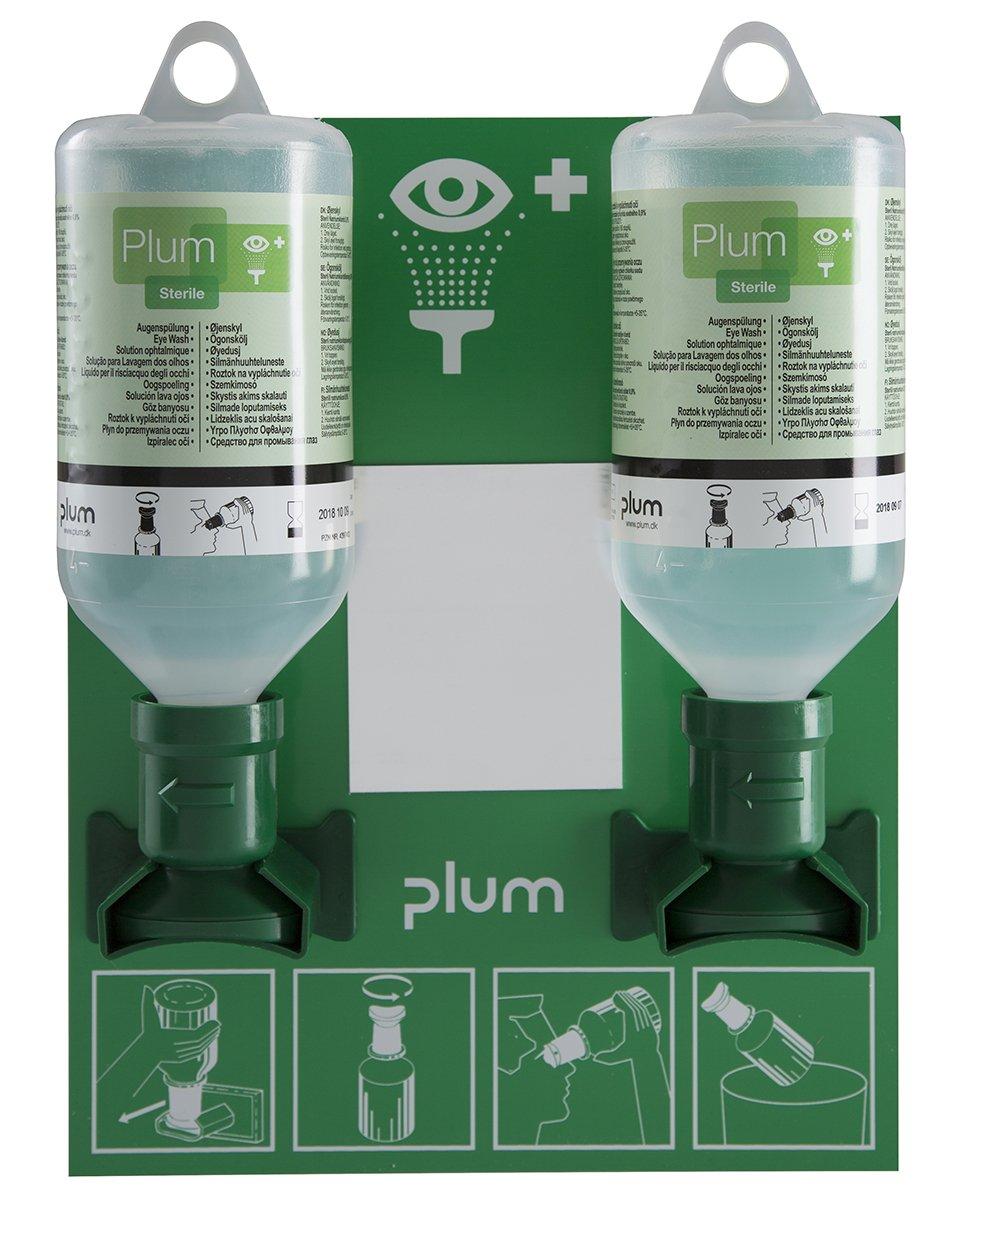 Plum 46948 Small Open Eyewash Station, 11'' Height, 3.25'' Wide, 8.5'' Length, 16.9  fl. oz., Polystyrene